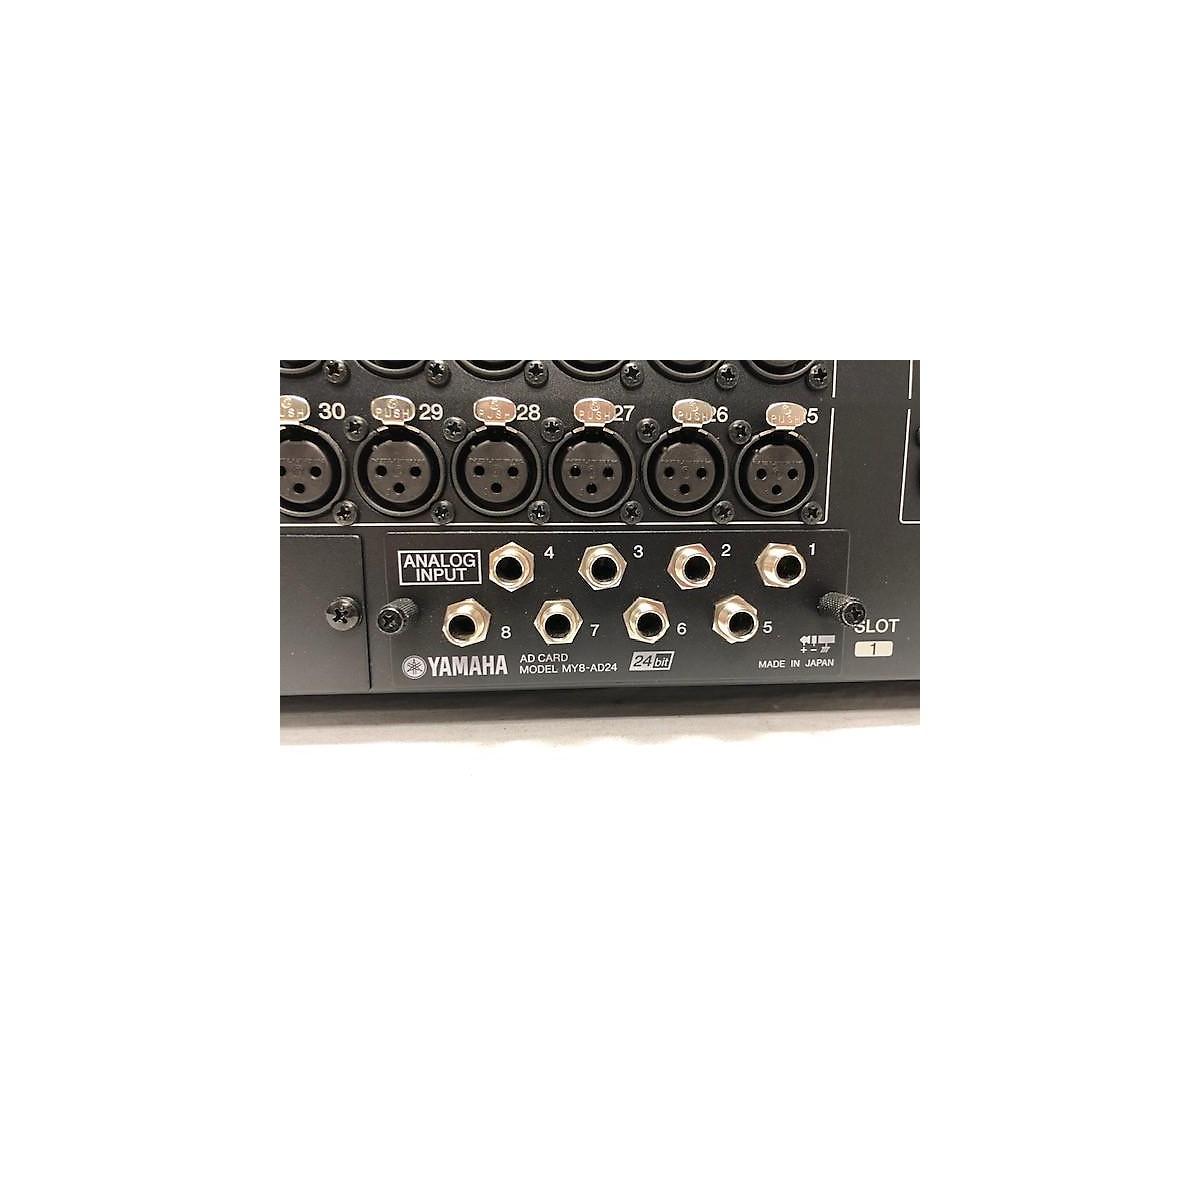 Yamaha MY8-AD24 Power Amp